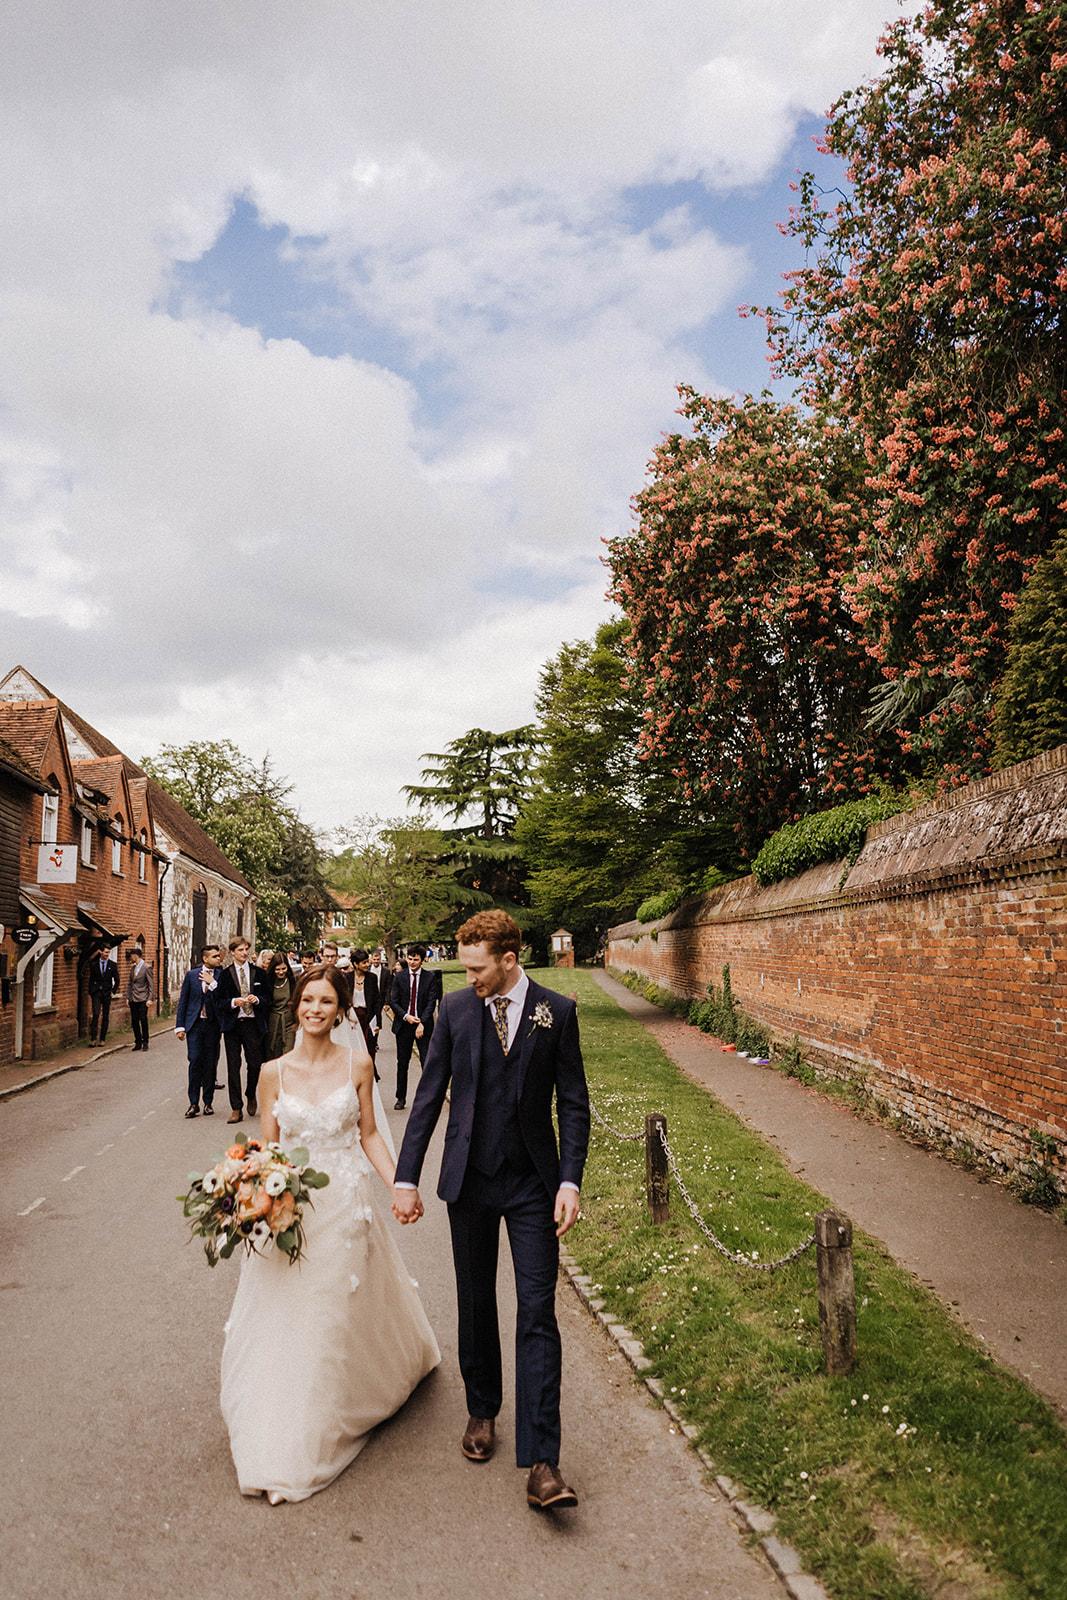 the-olde-bell-wedding-photography-jade-jonnie-219.jpg